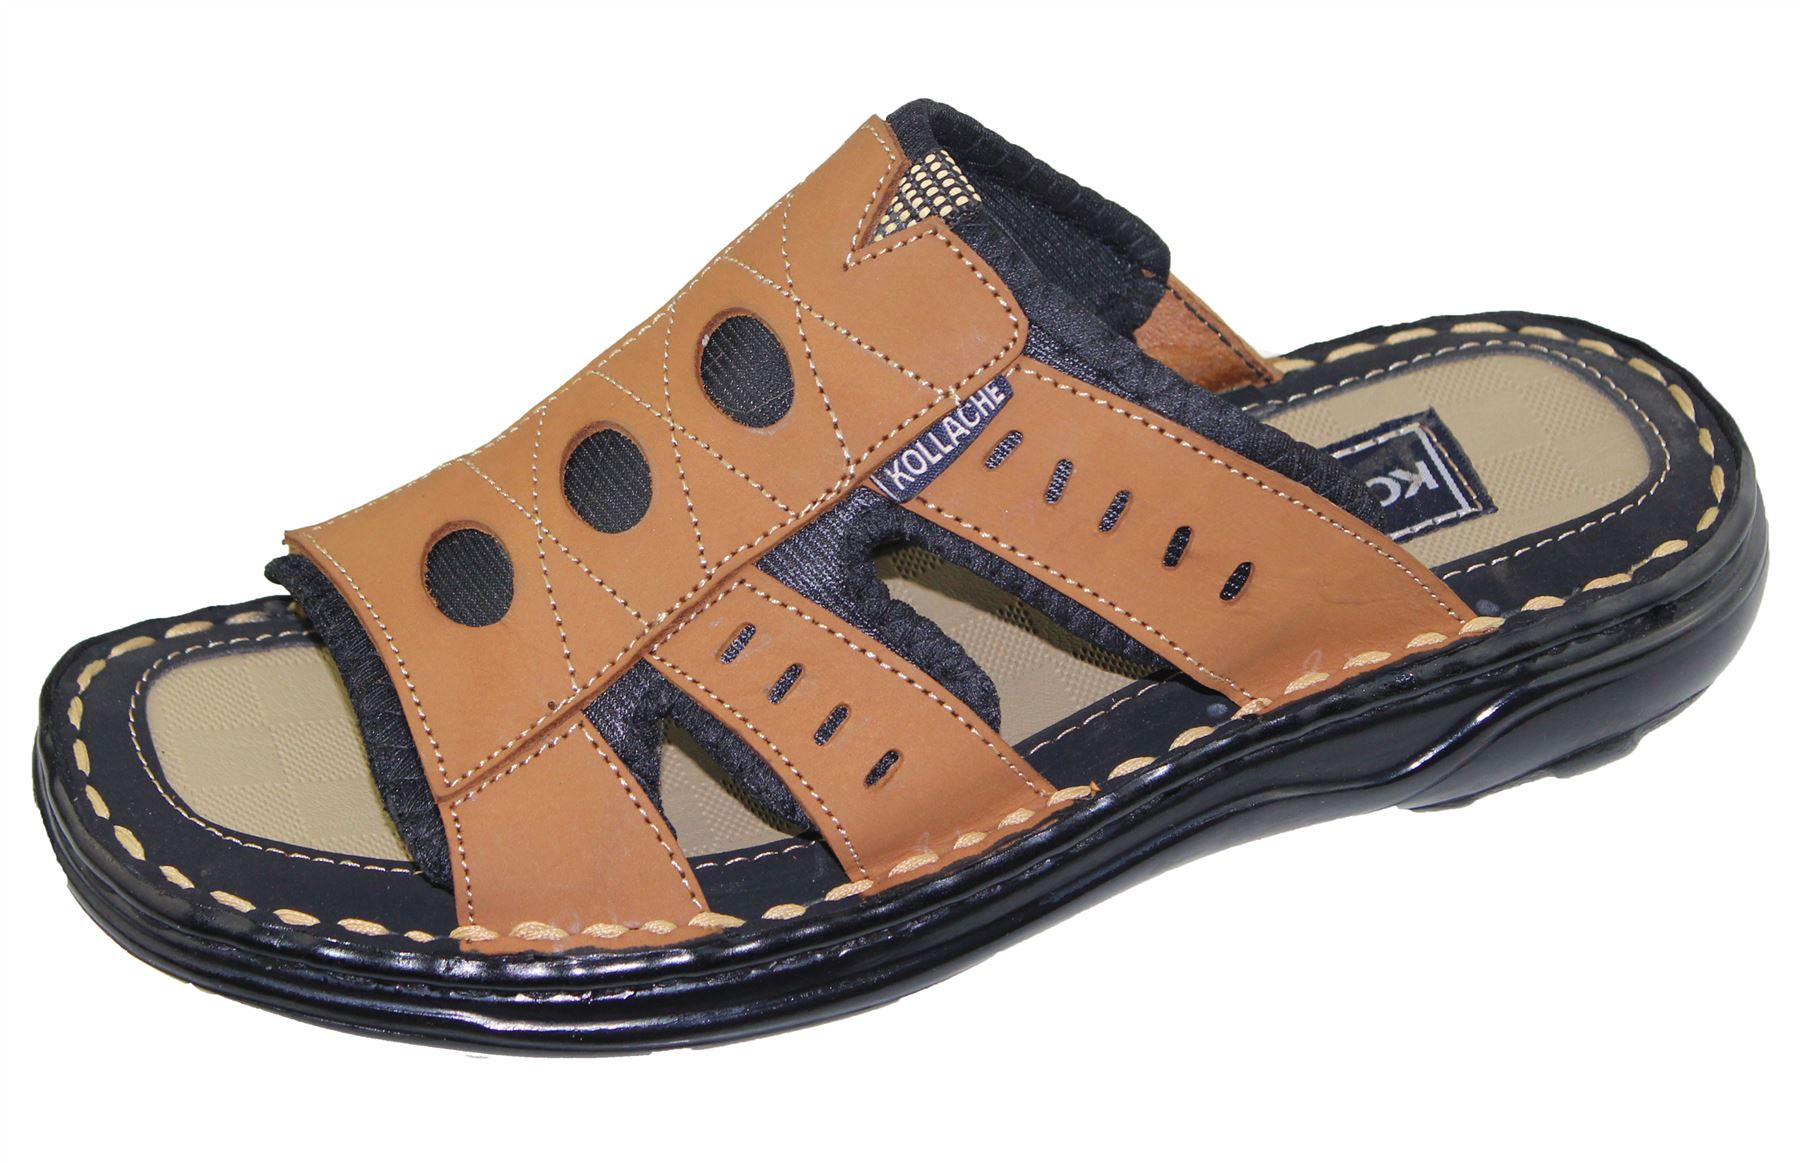 Mens-Slipper-Sandal-Sports-Beach-Buckle-Walking-Fashion-Summer-Casual-Shoes-Size miniatura 33